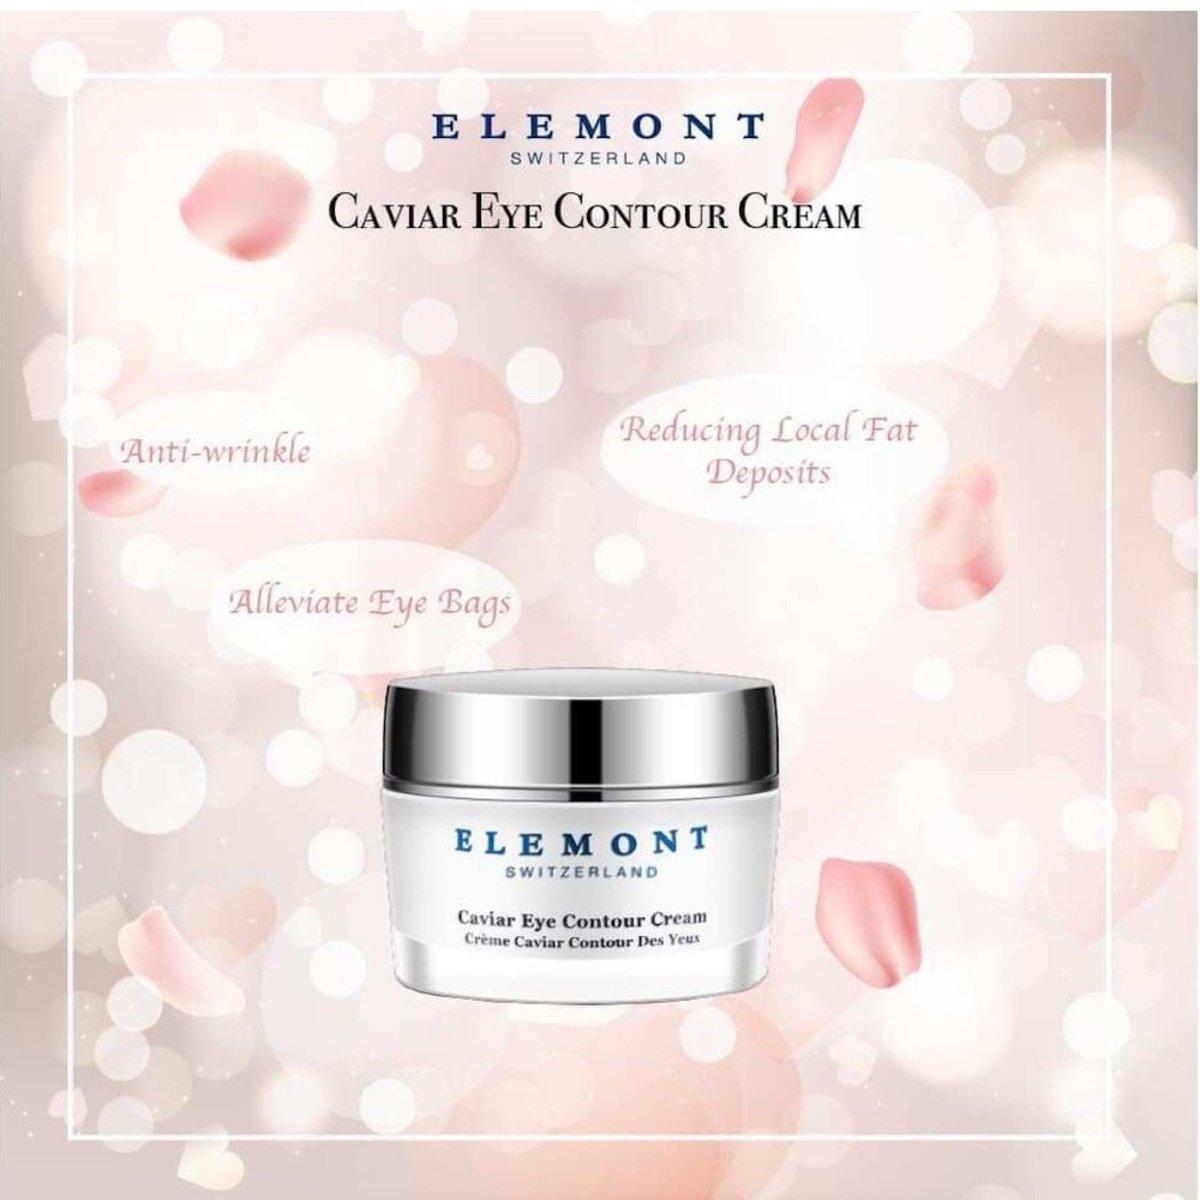 Caviar Eye Contour Cream